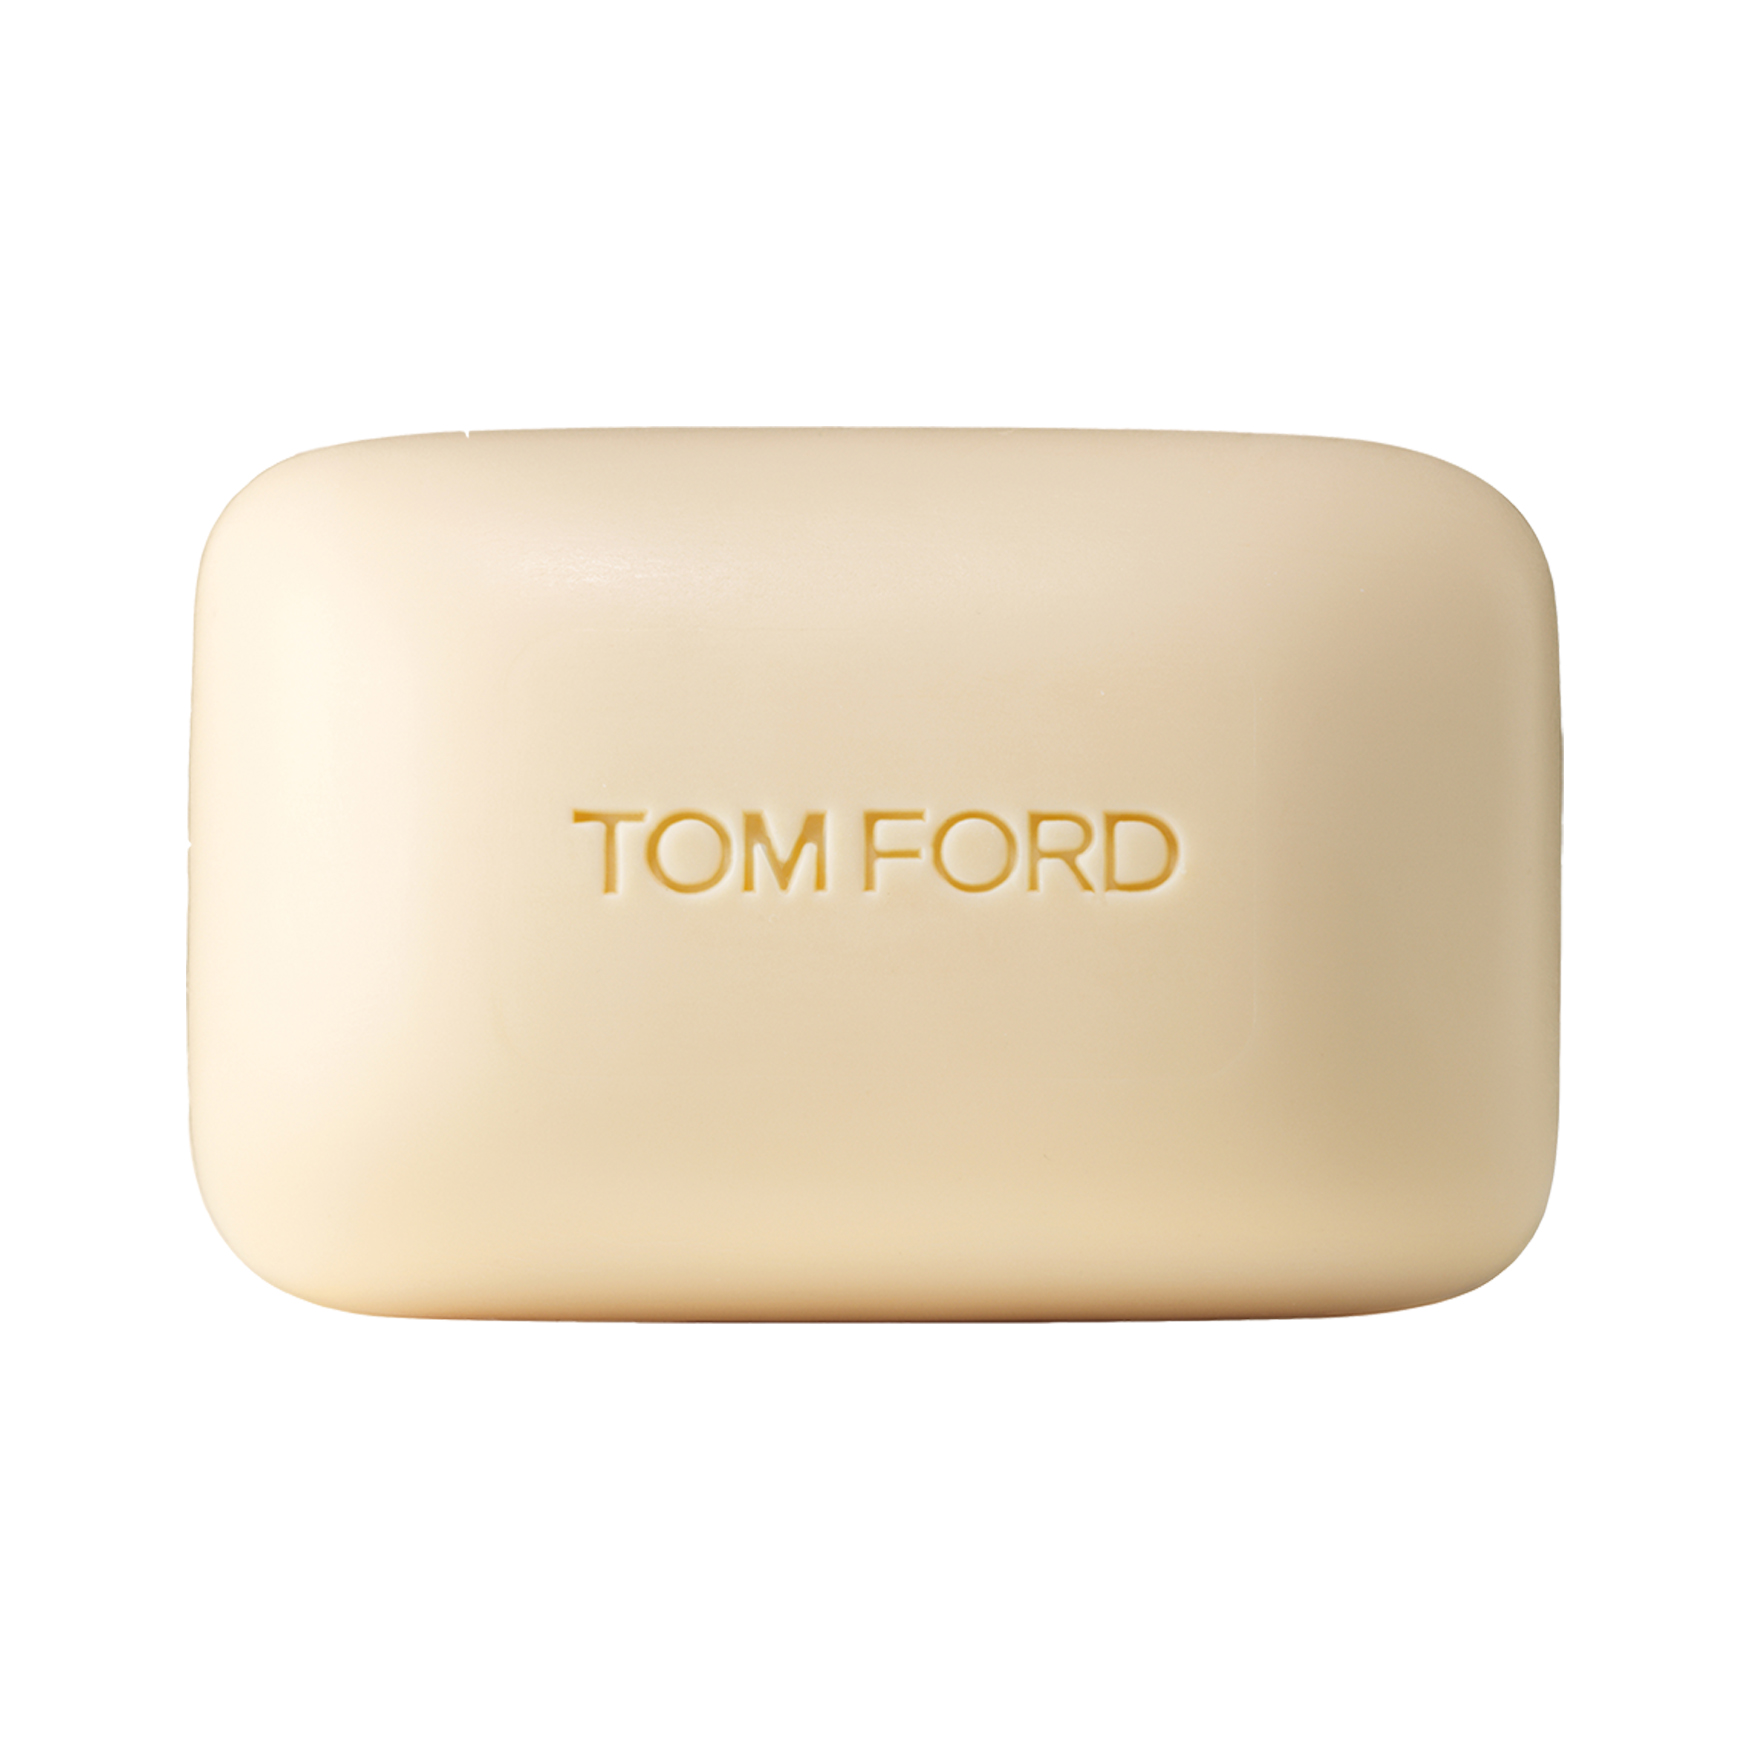 bff6507199d UK200009614 TOM FORD.jpg